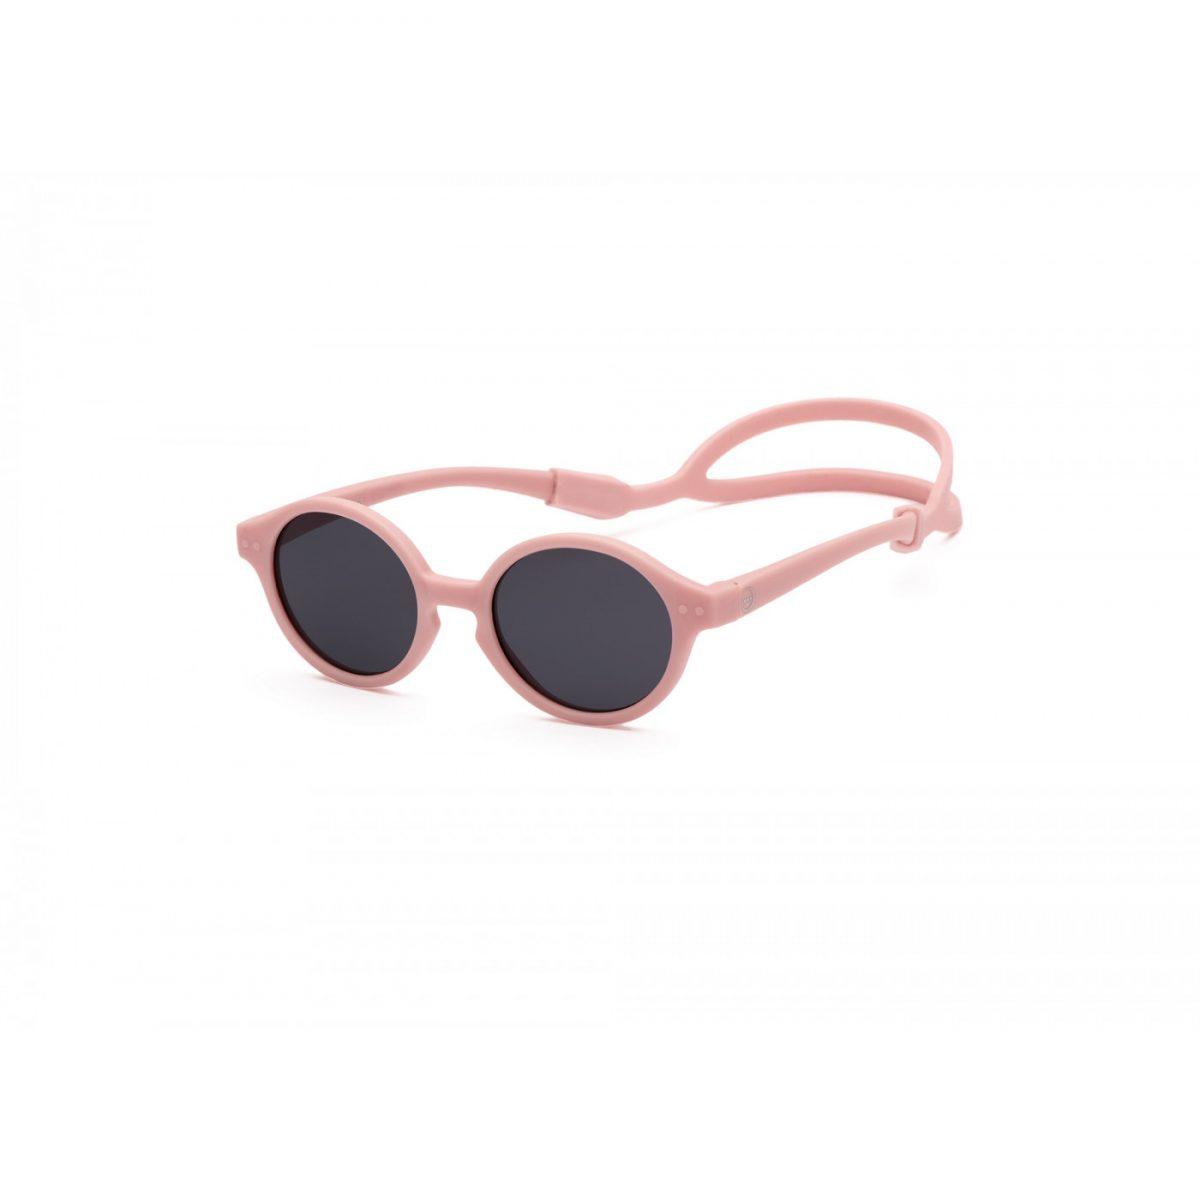 sun-baby-pastel-pink-sunglasses-baby (1)